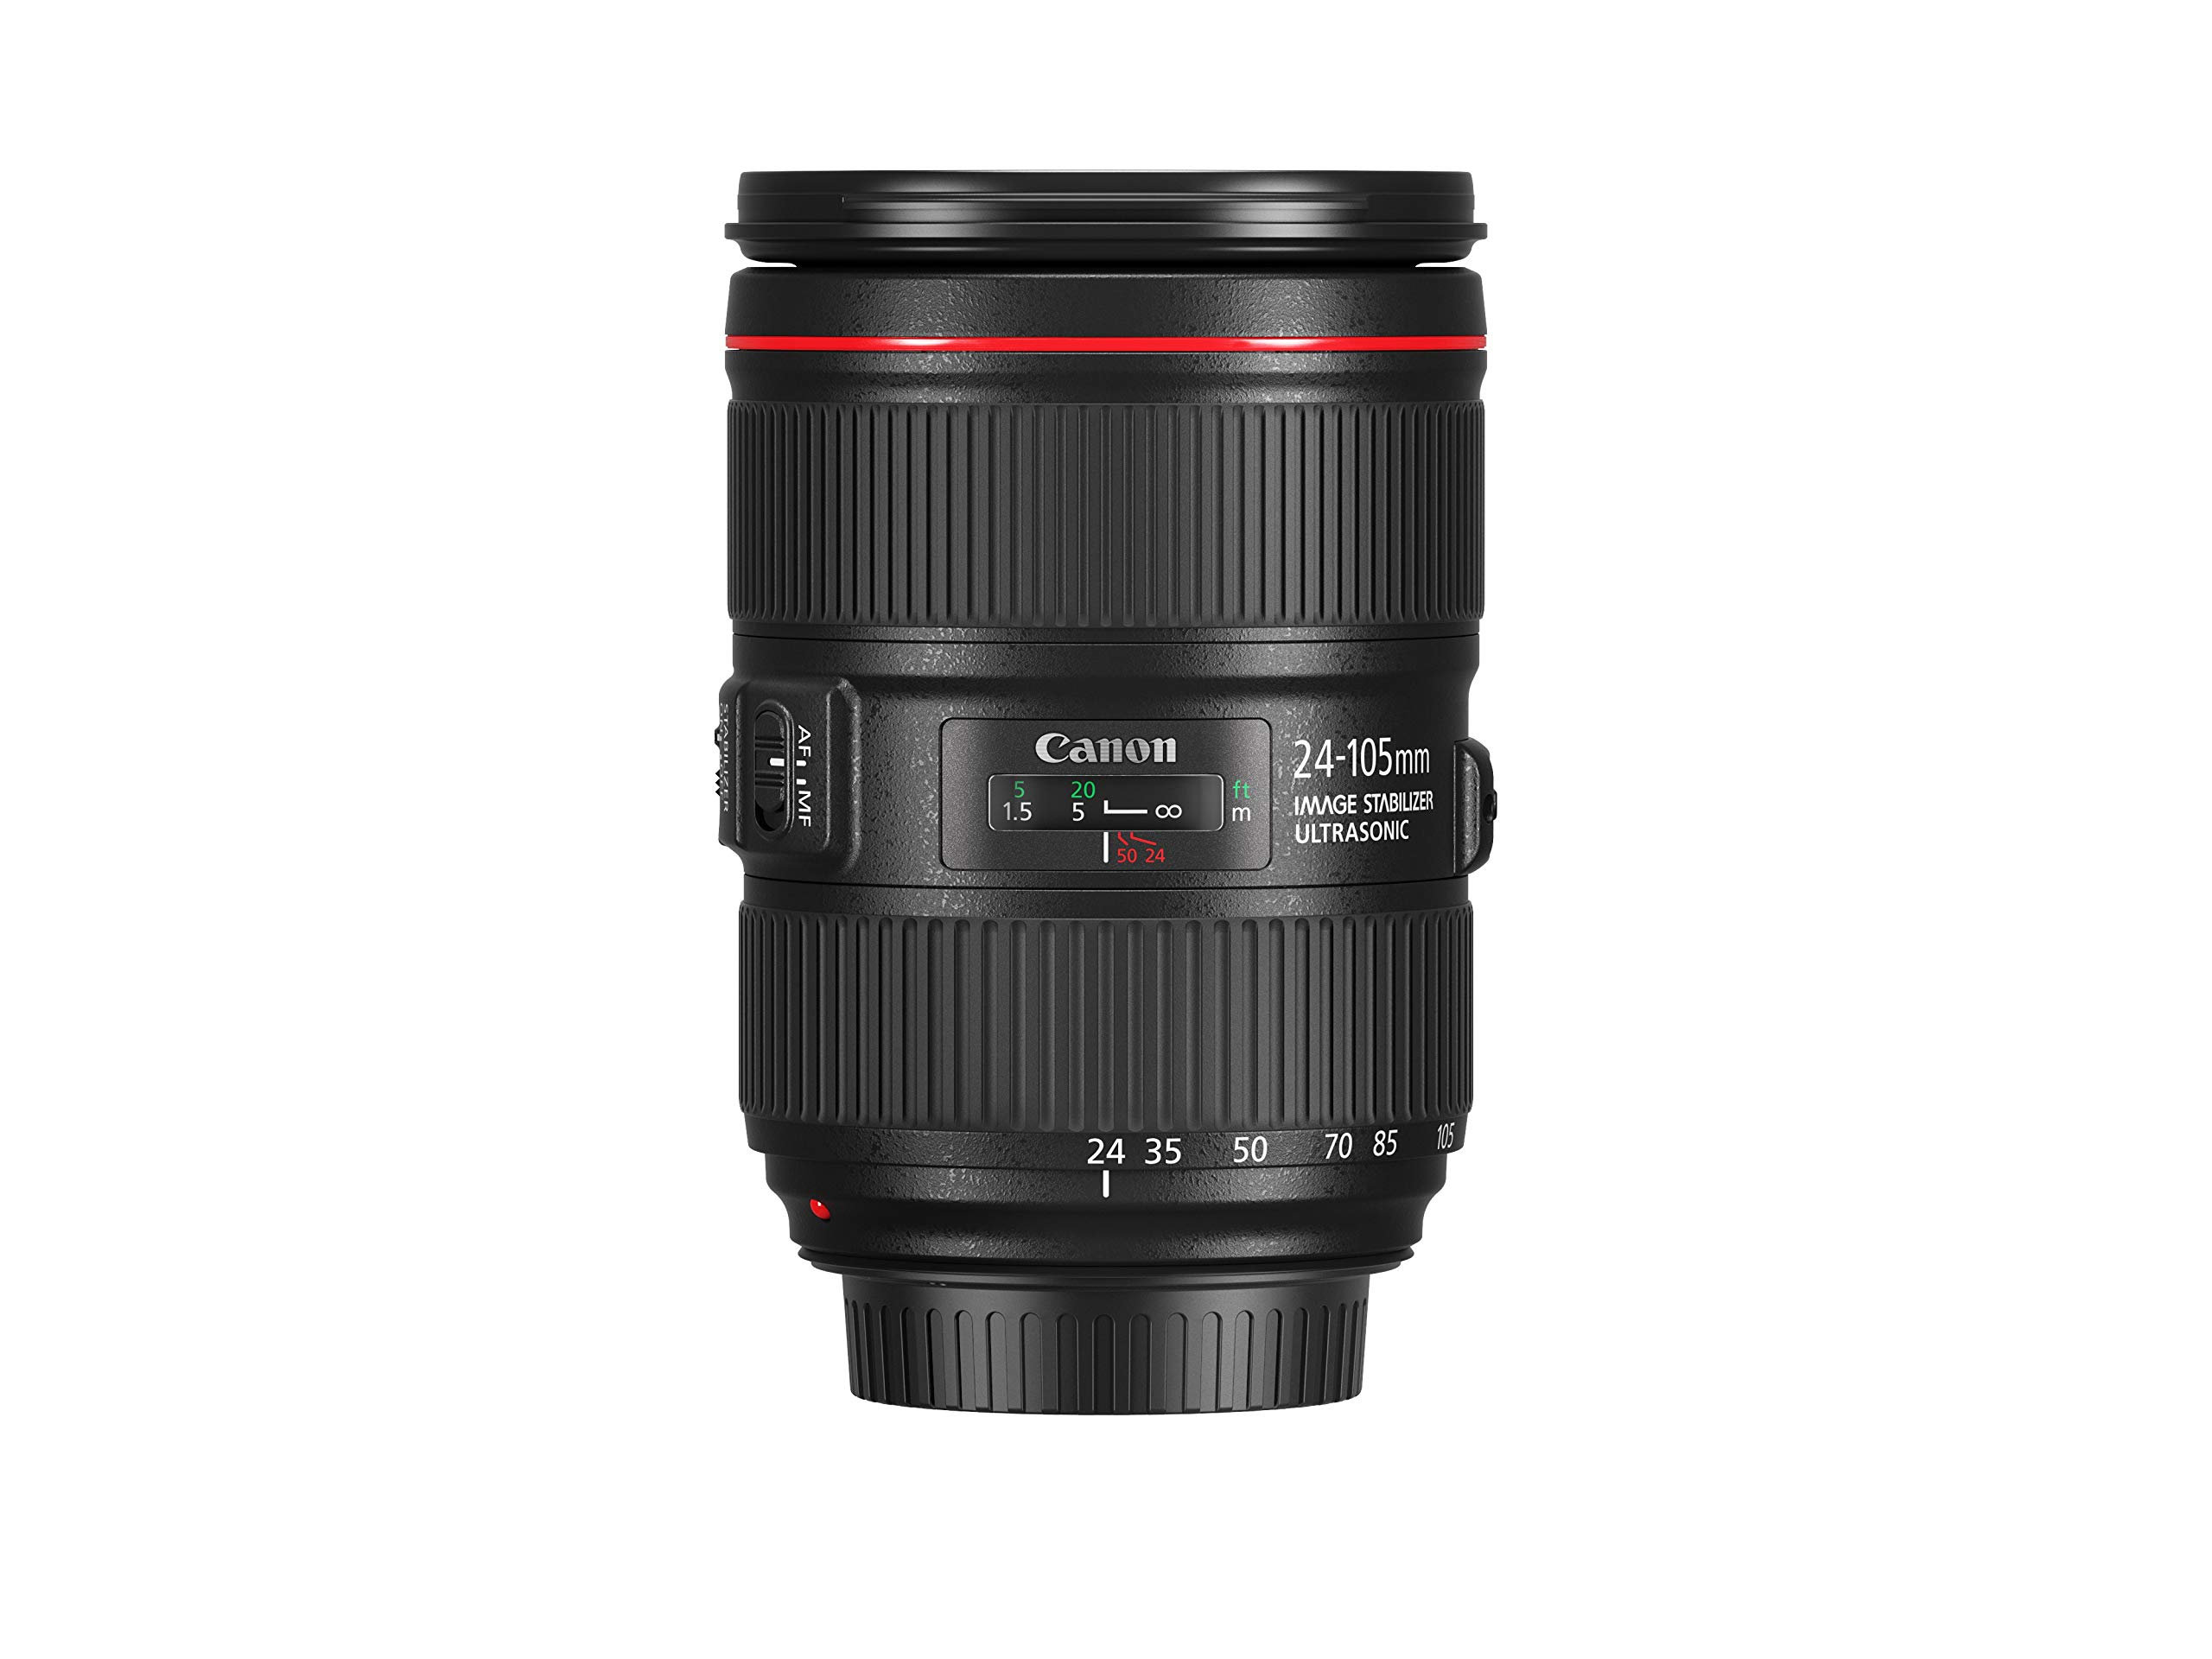 Canon ZOOM LENS EF24 105mm F4L